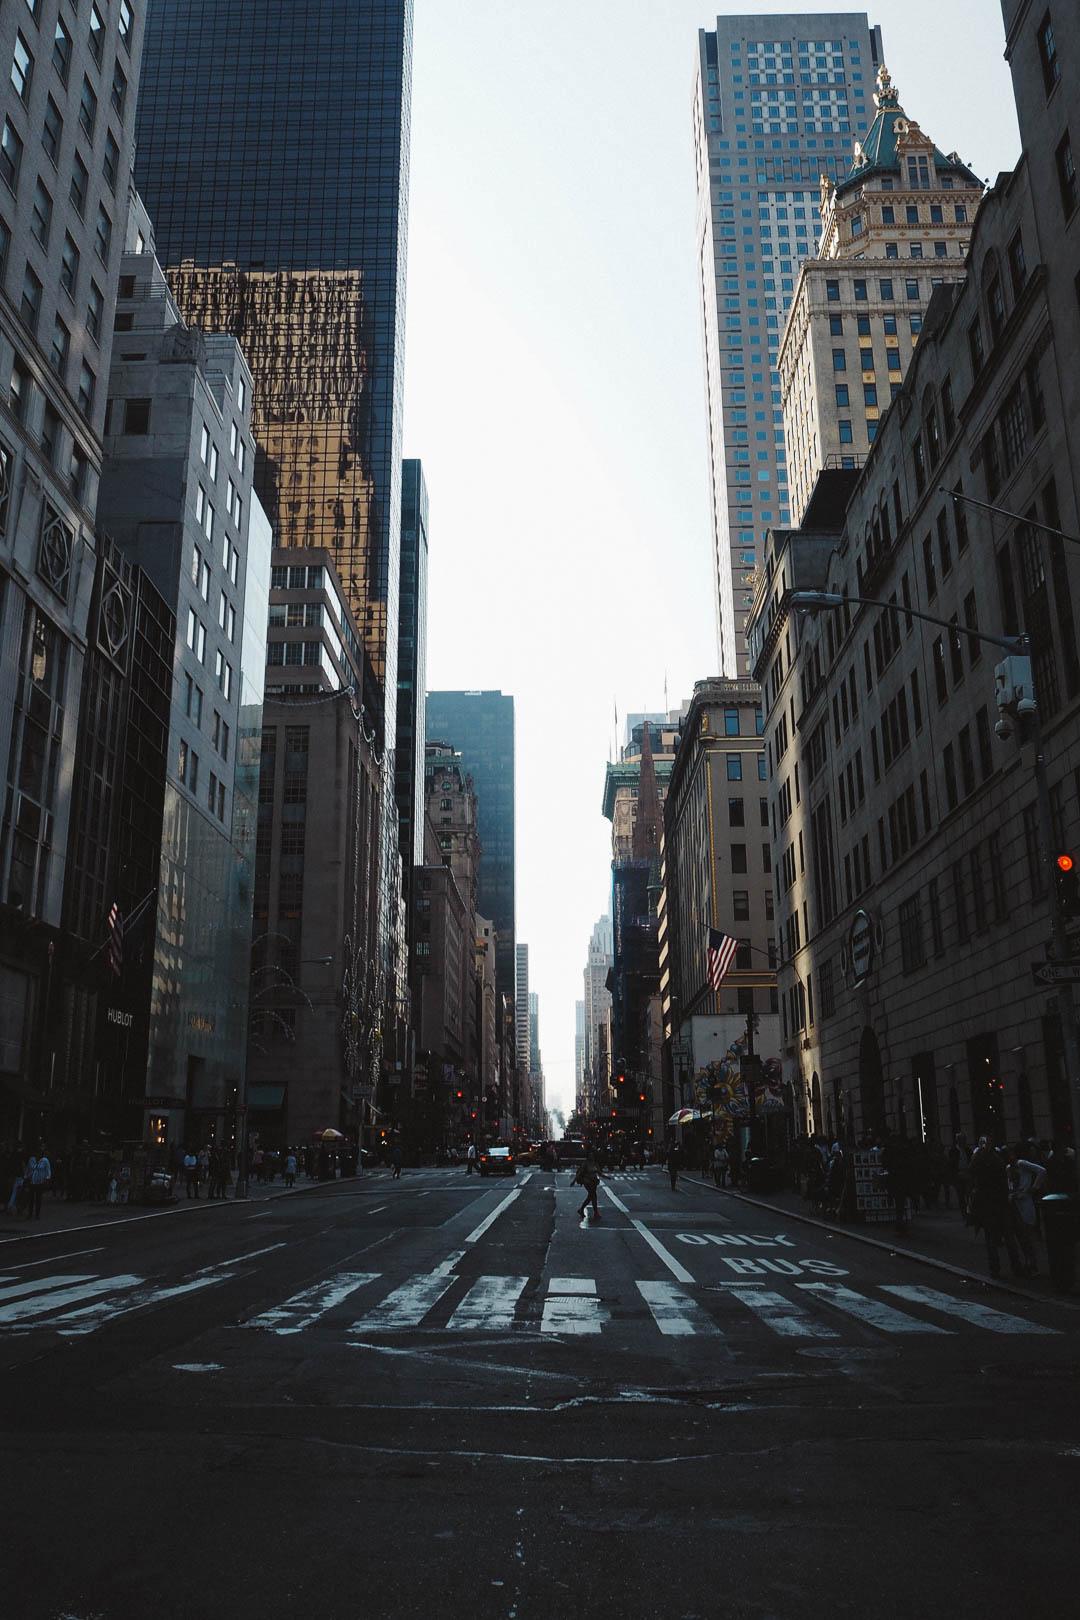 newyork-133-of-171